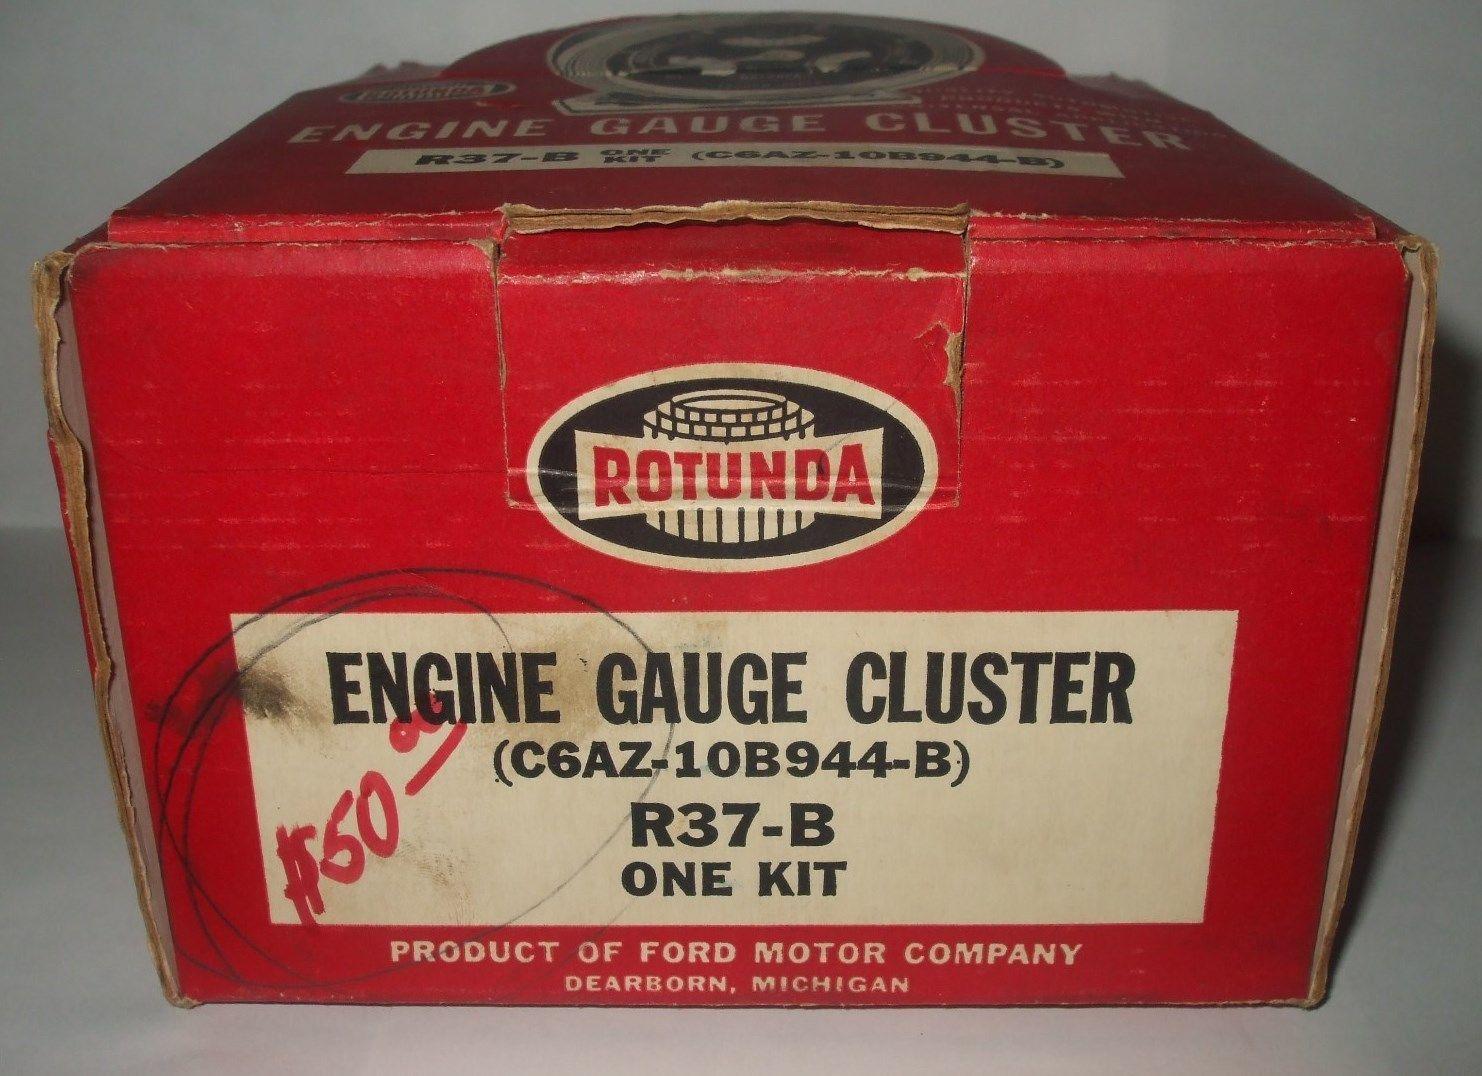 Vintage Original Rotunda R37B Ford C6AZ 10B944 B Gauge Cluster FoMoCo RARE   eBay